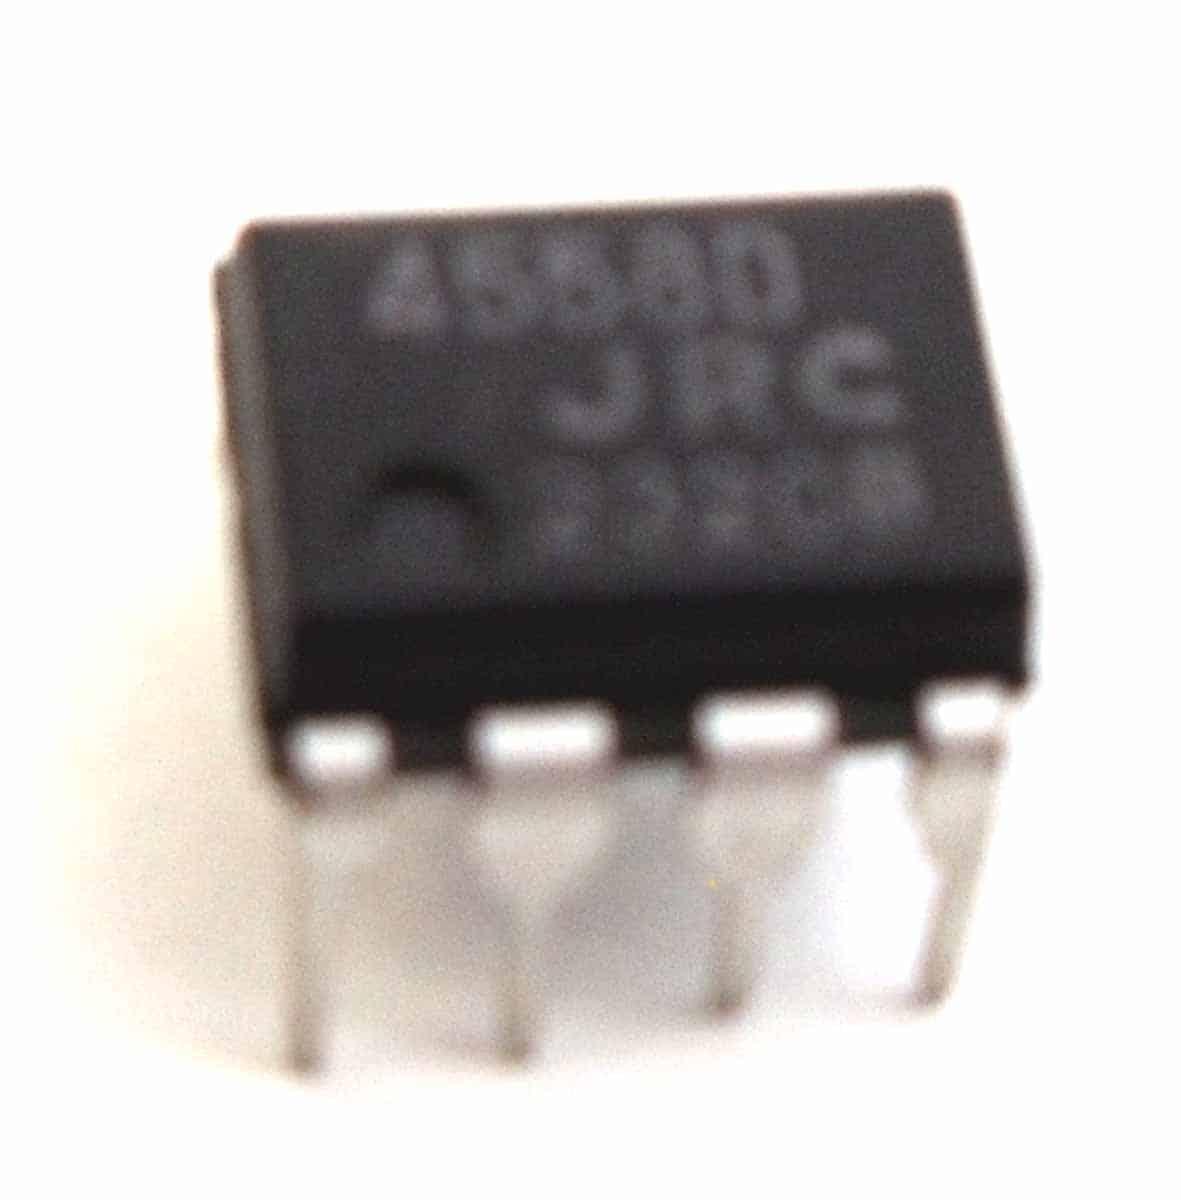 NJM4558 - Linear I.C. - Jrc